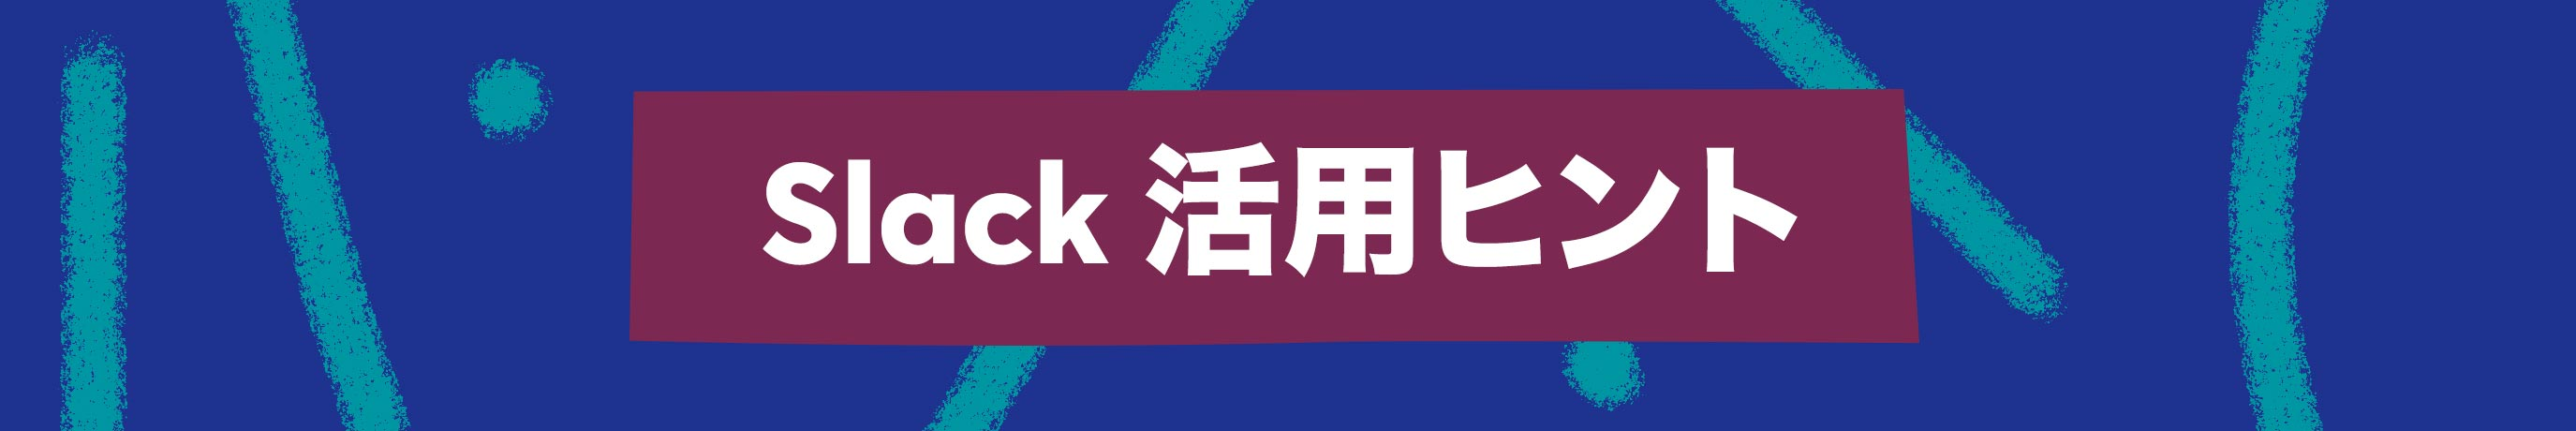 Slack tips in Japanese